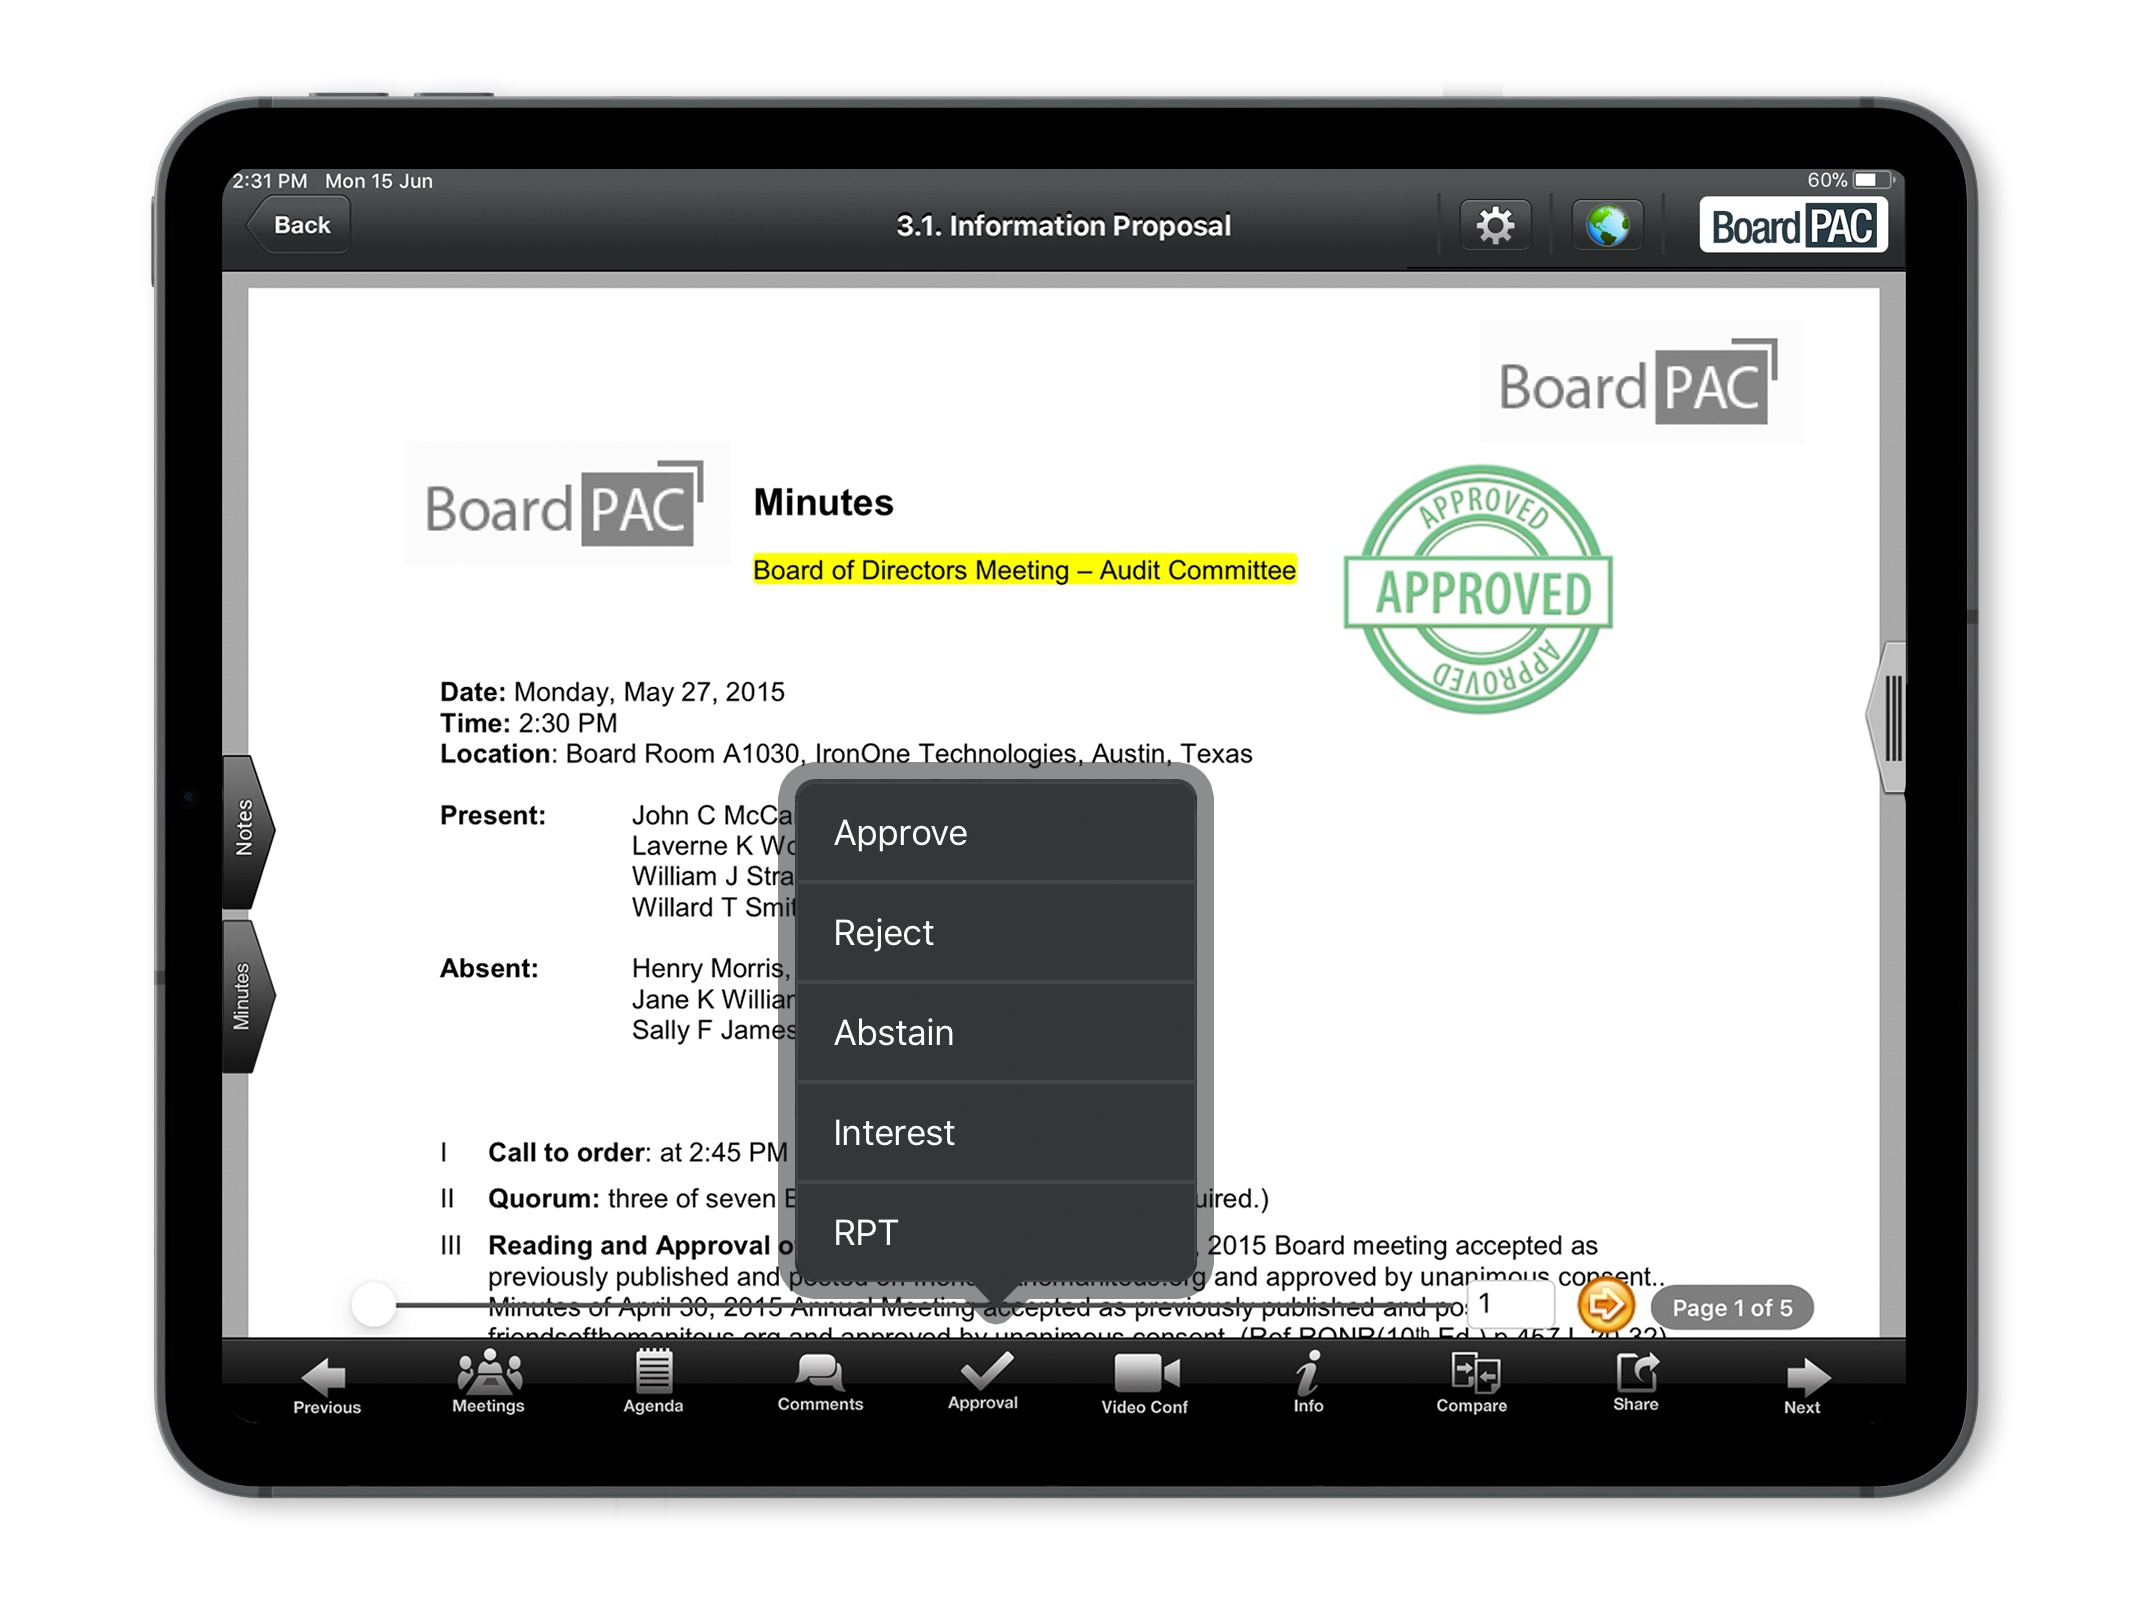 BoardPAC Software - 3